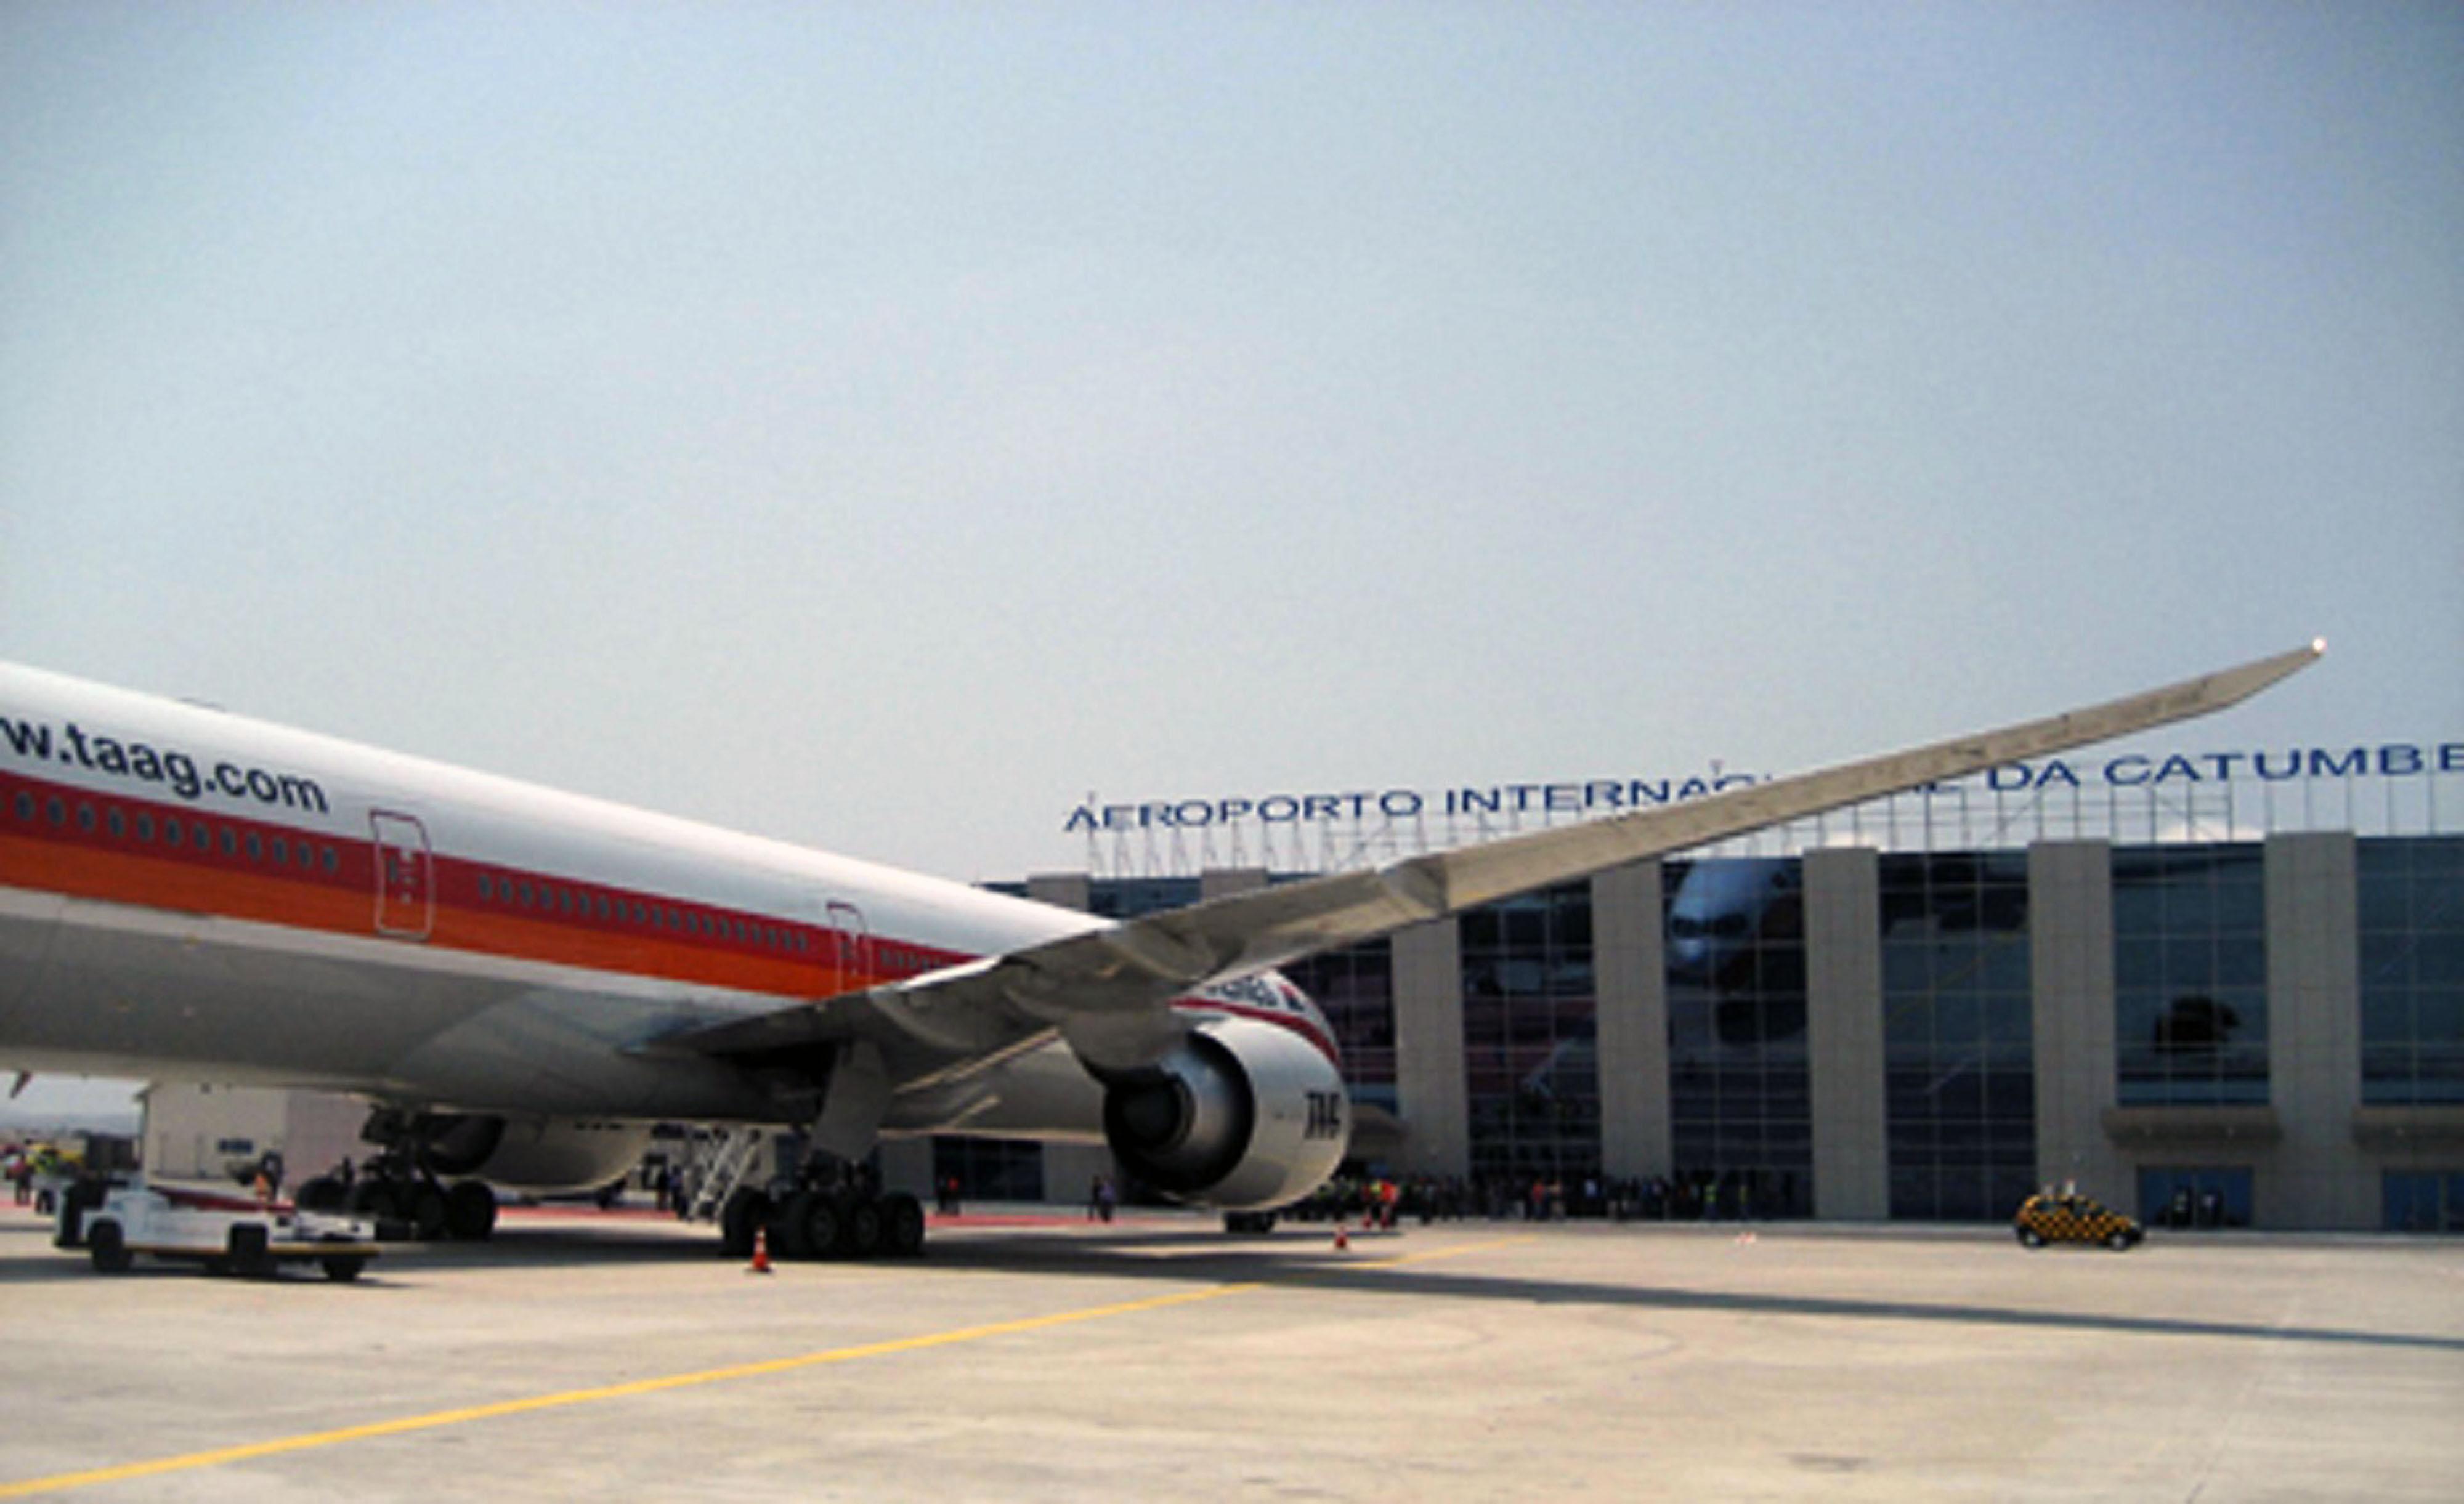 Aeroporto Dili : Https: newsavia.com newsavia 2014 01 30t10:52:19z https